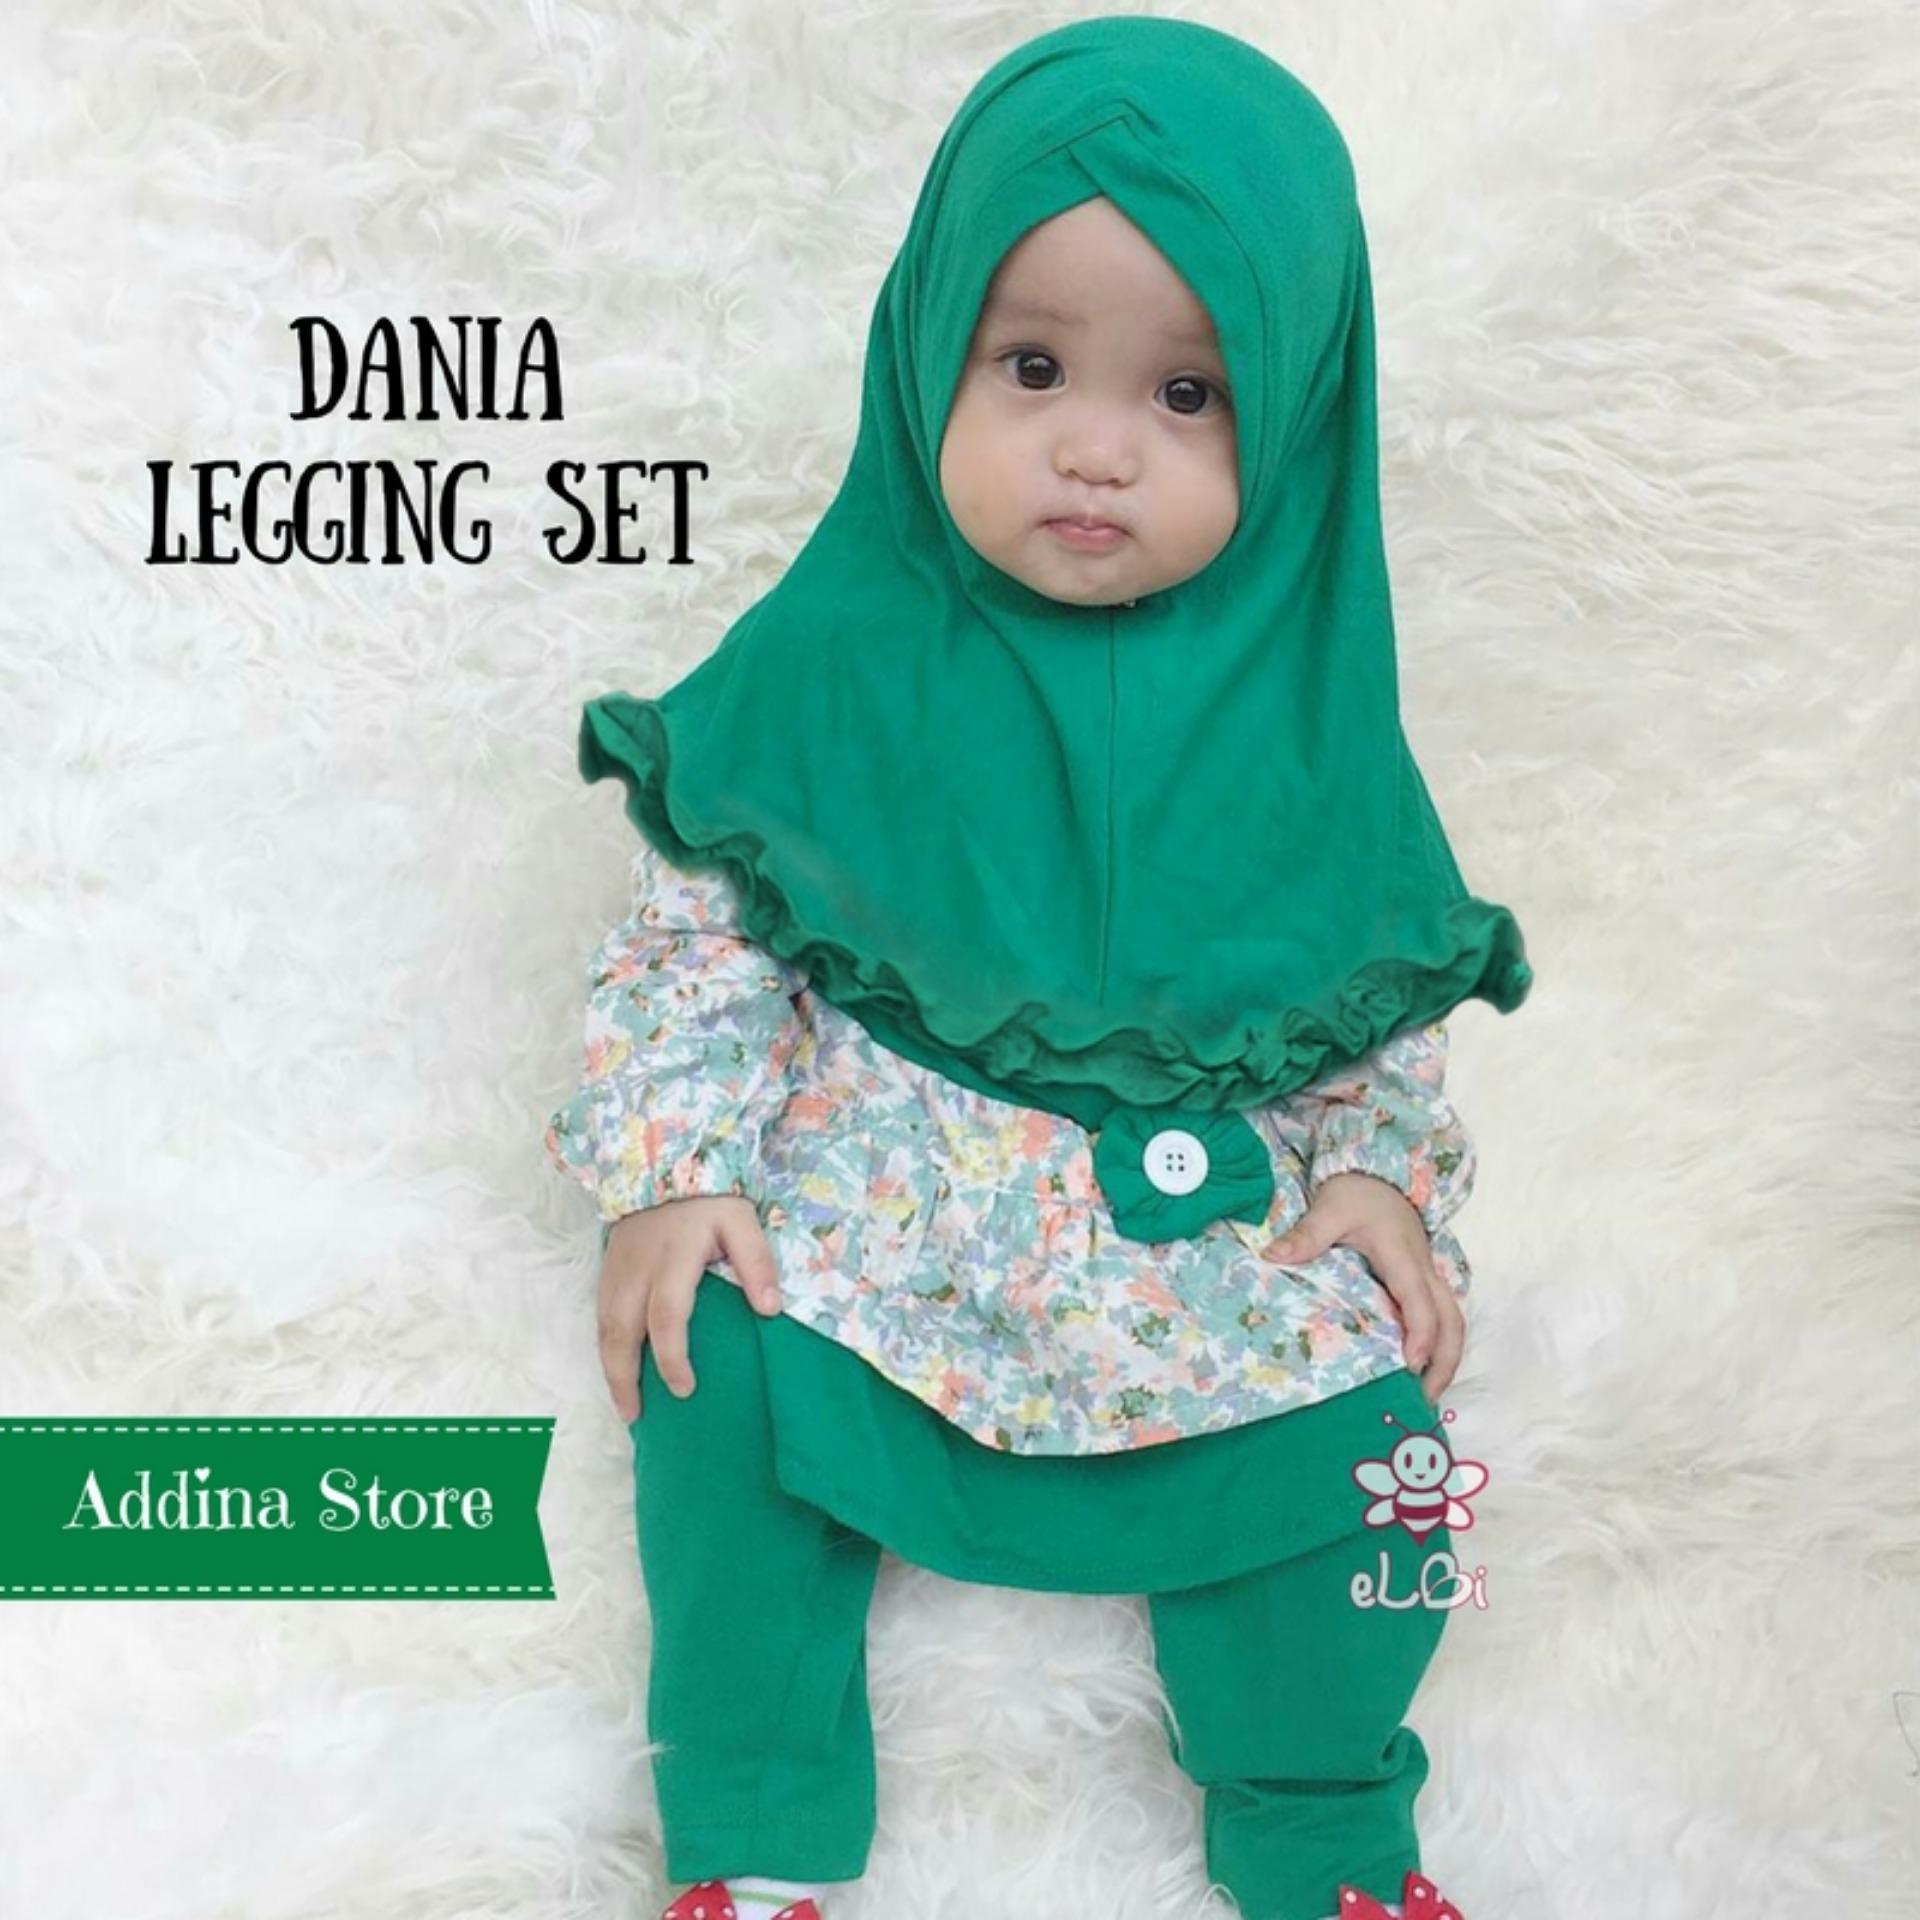 Elbi Dania Legging Set / Baju Anak / Baju Anak Perempuan / Baju Anak Perempuan Muslim / Baju Anak Perempuan Murah / Addina Store